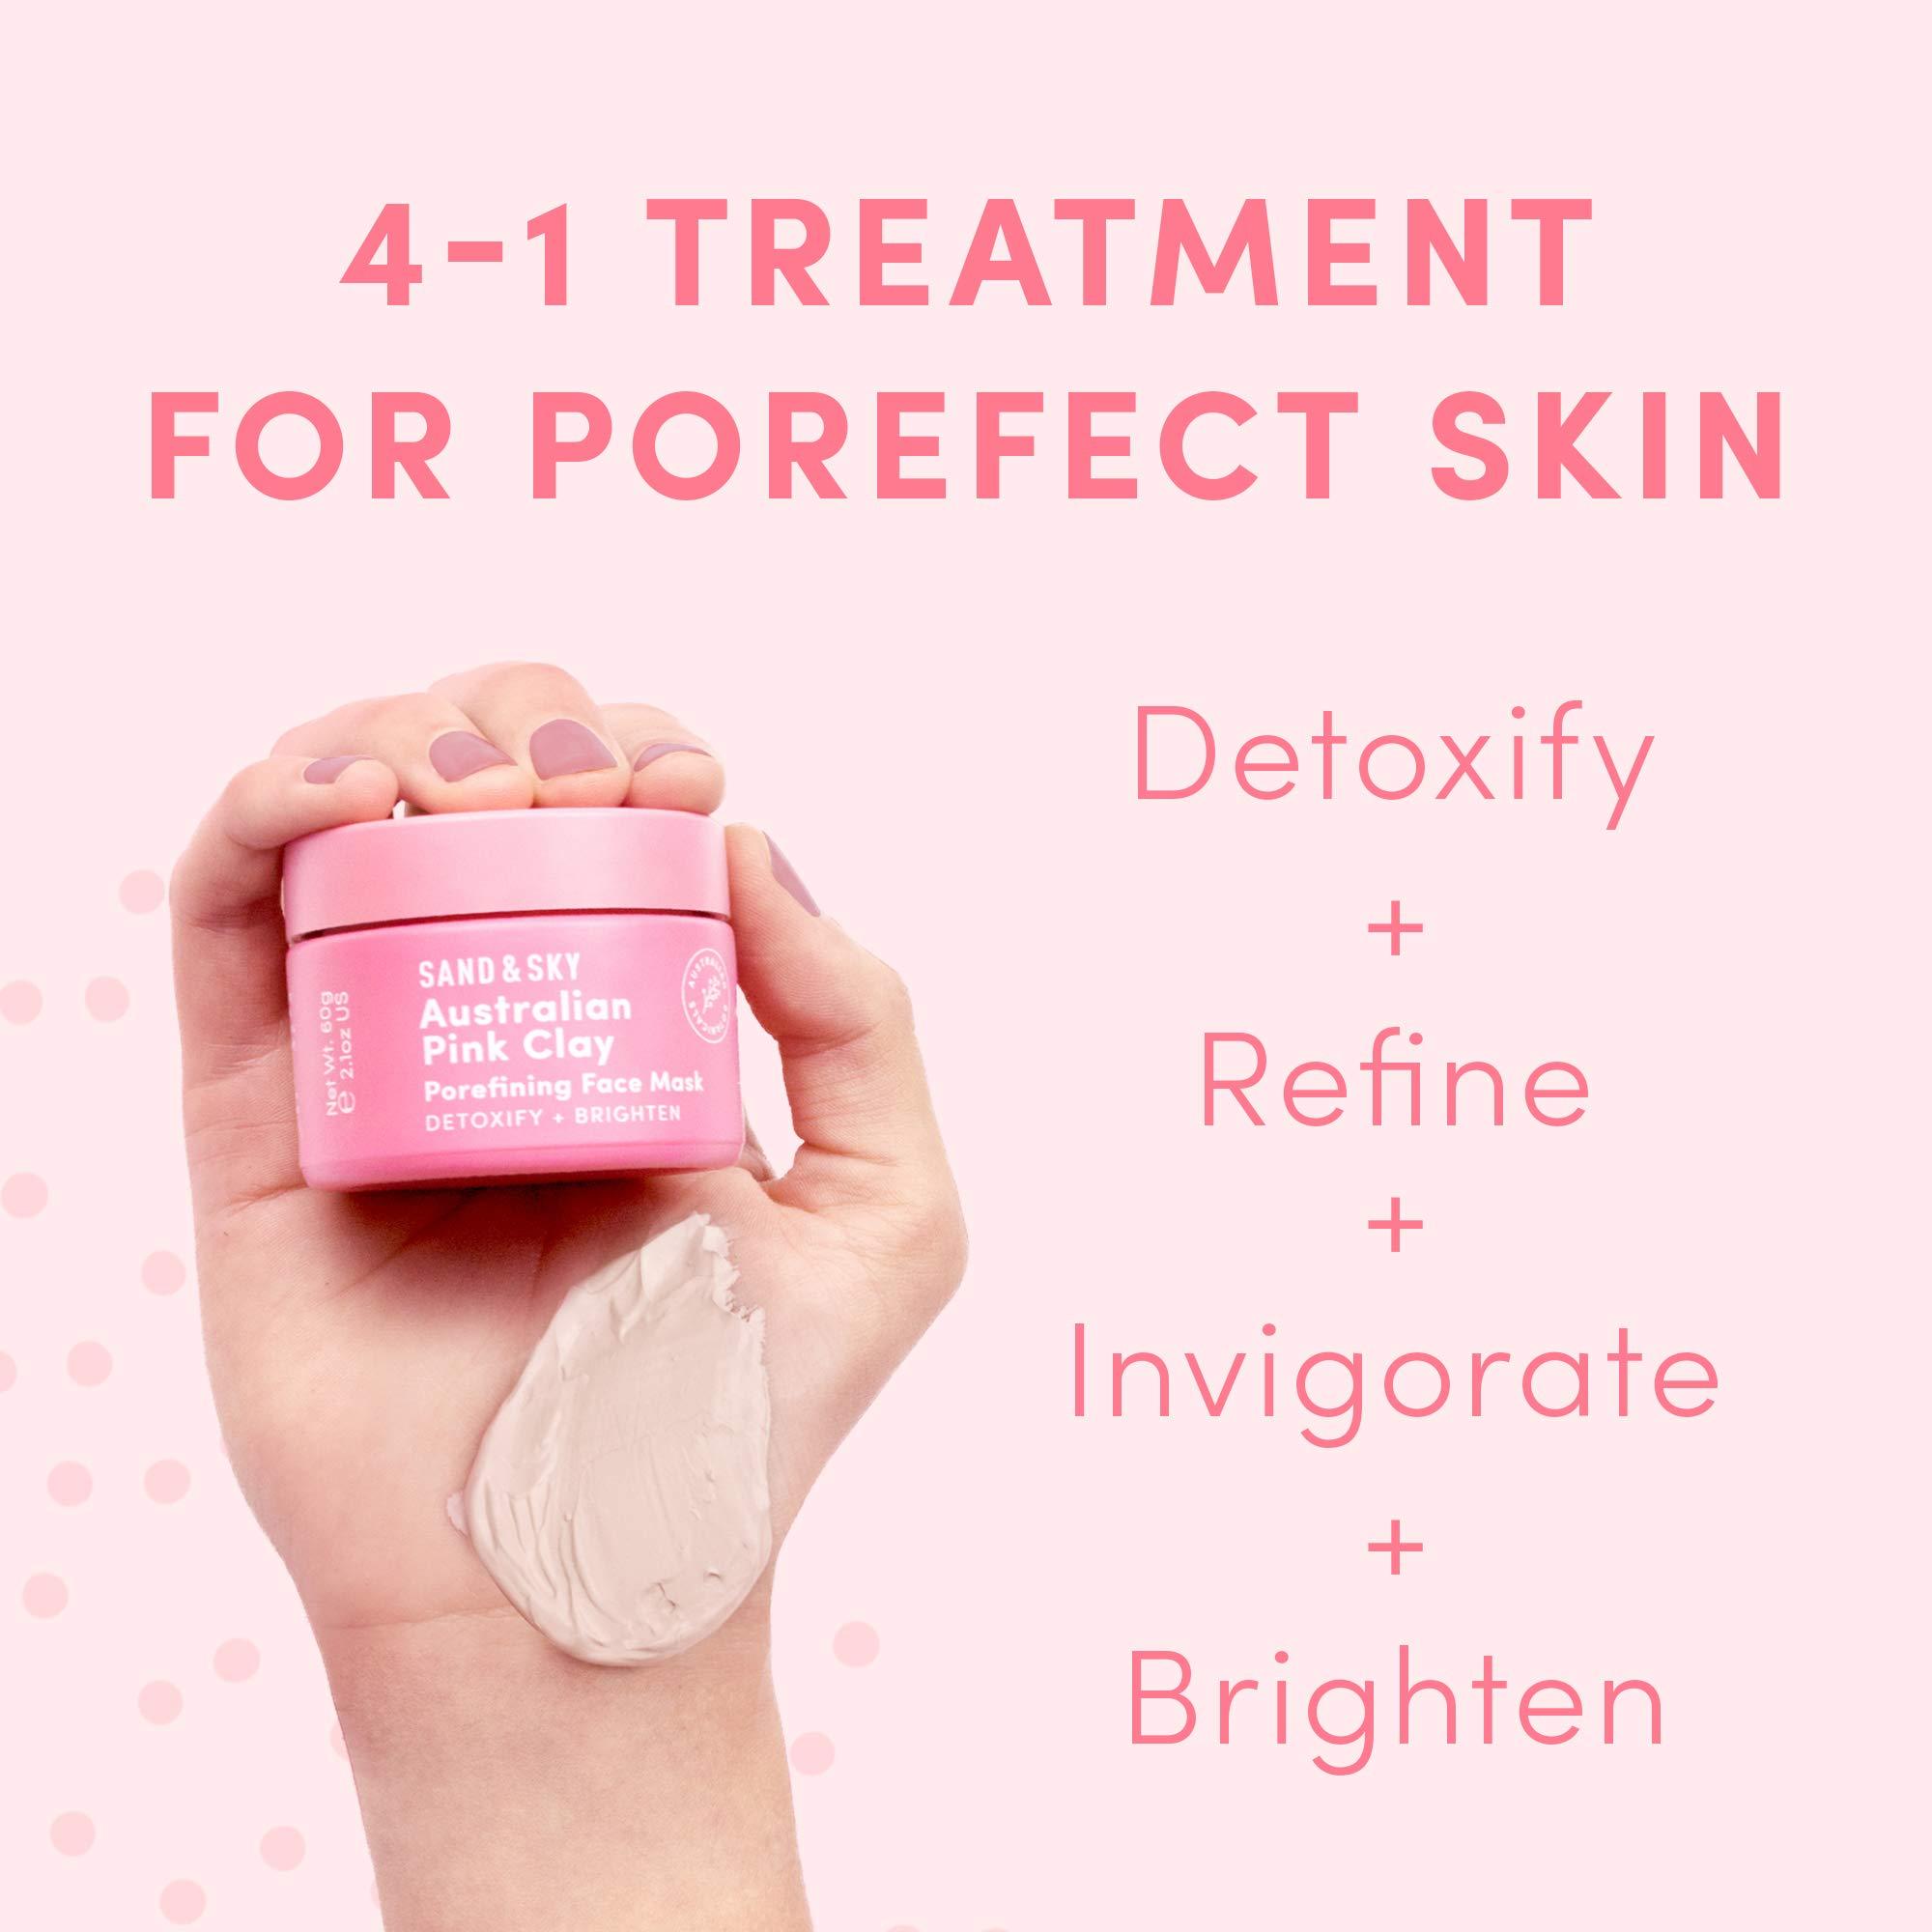 Sand & Sky Australian Pink Clay Porefining Face Mask Skin Care | Pore Minimizer With Face Mask Brush Applicator